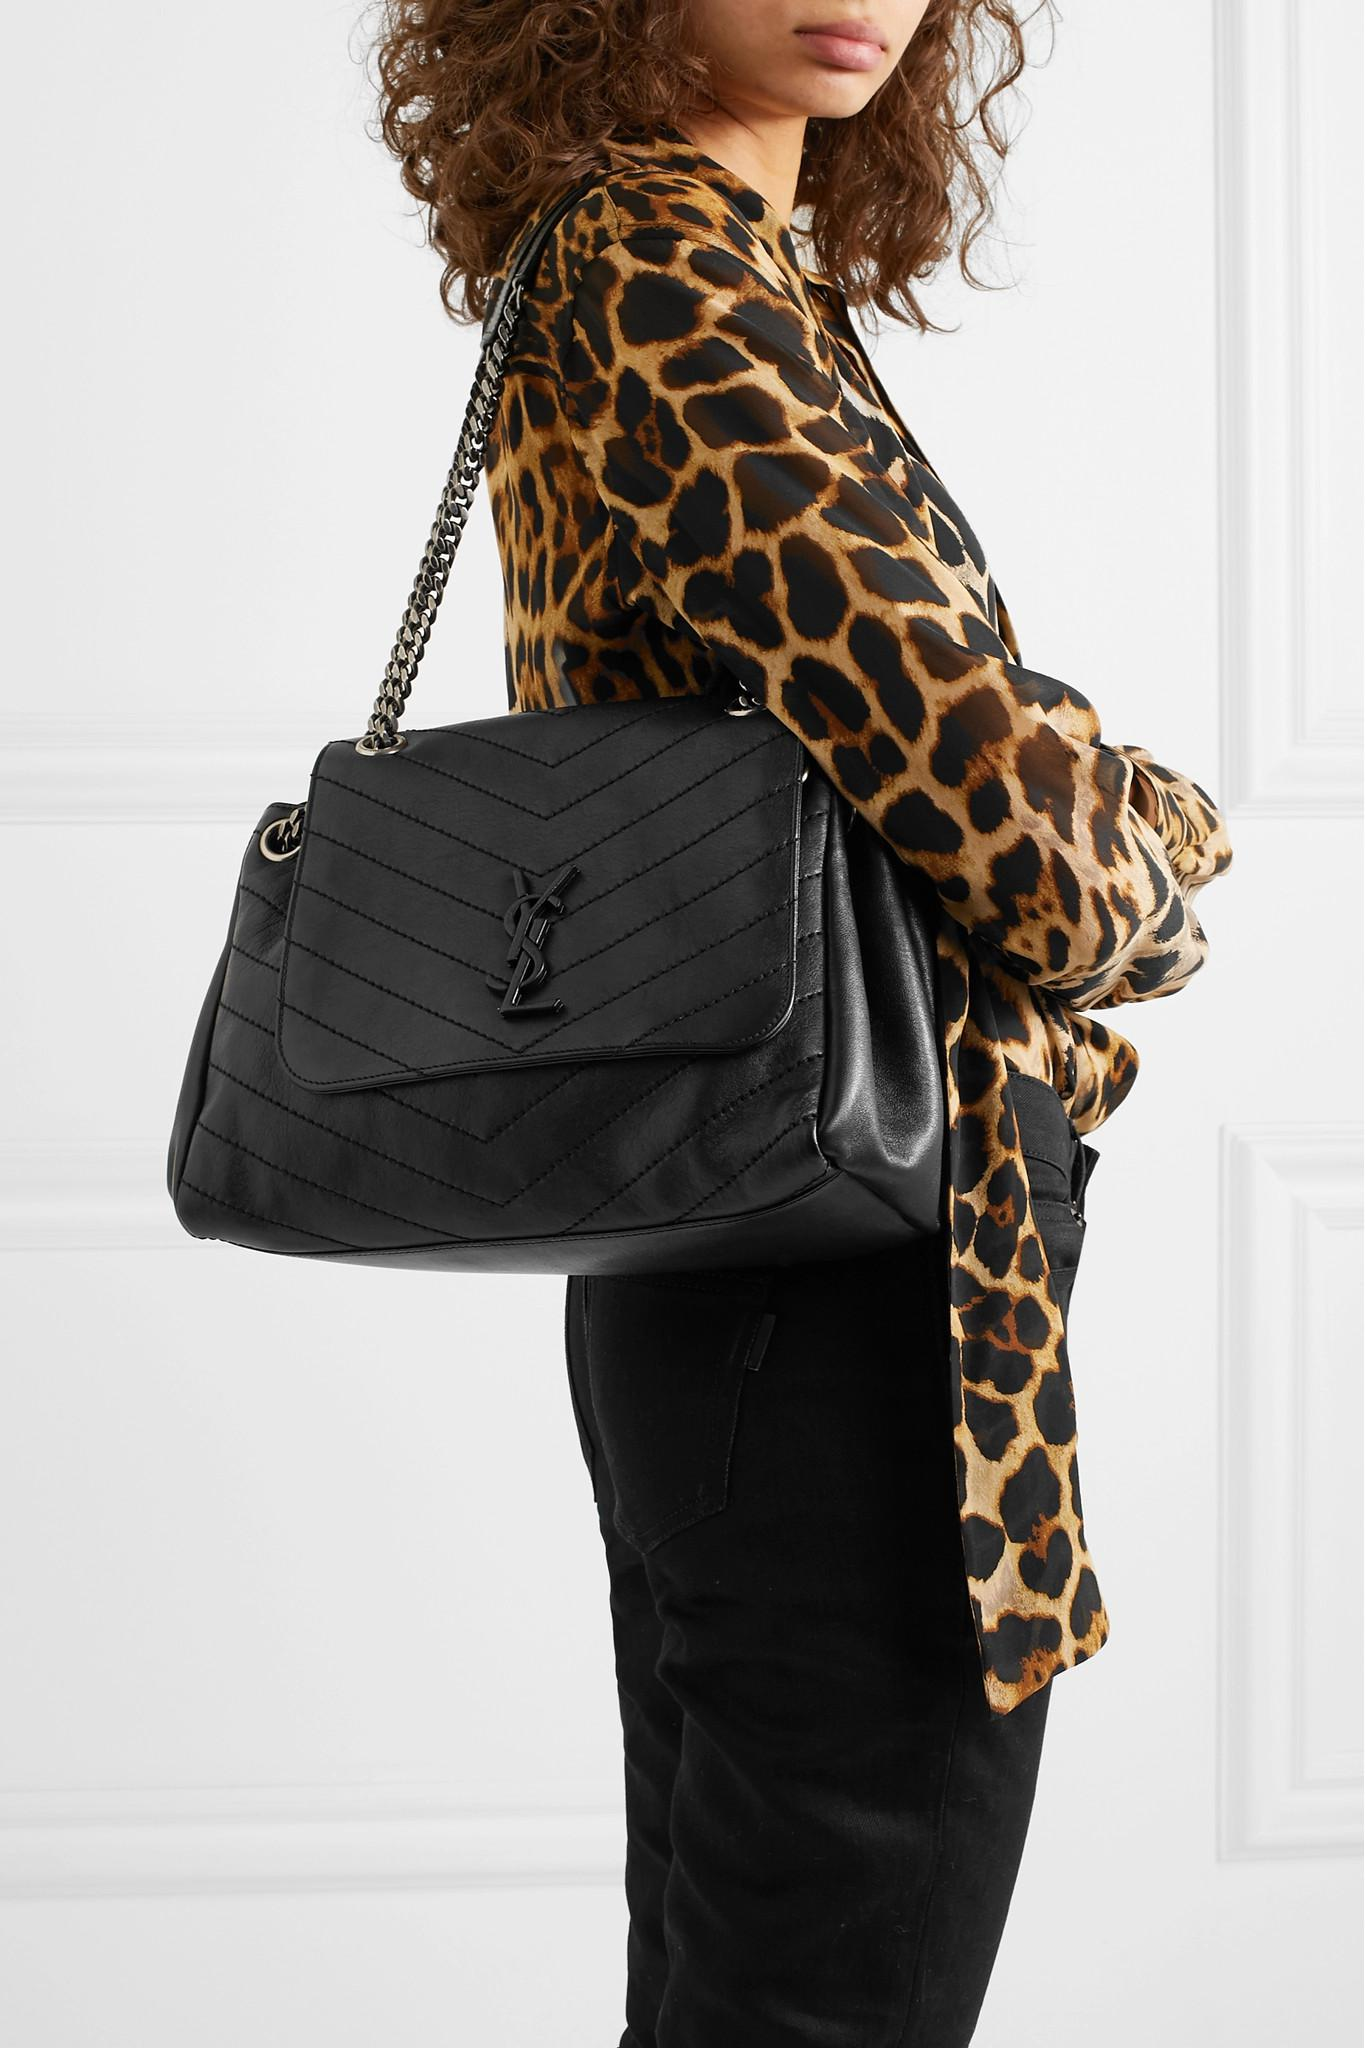 7b1a3a07a4e7 Saint Laurent - Black Nolita Large Quilted Leather Shoulder Bag - Lyst.  View fullscreen